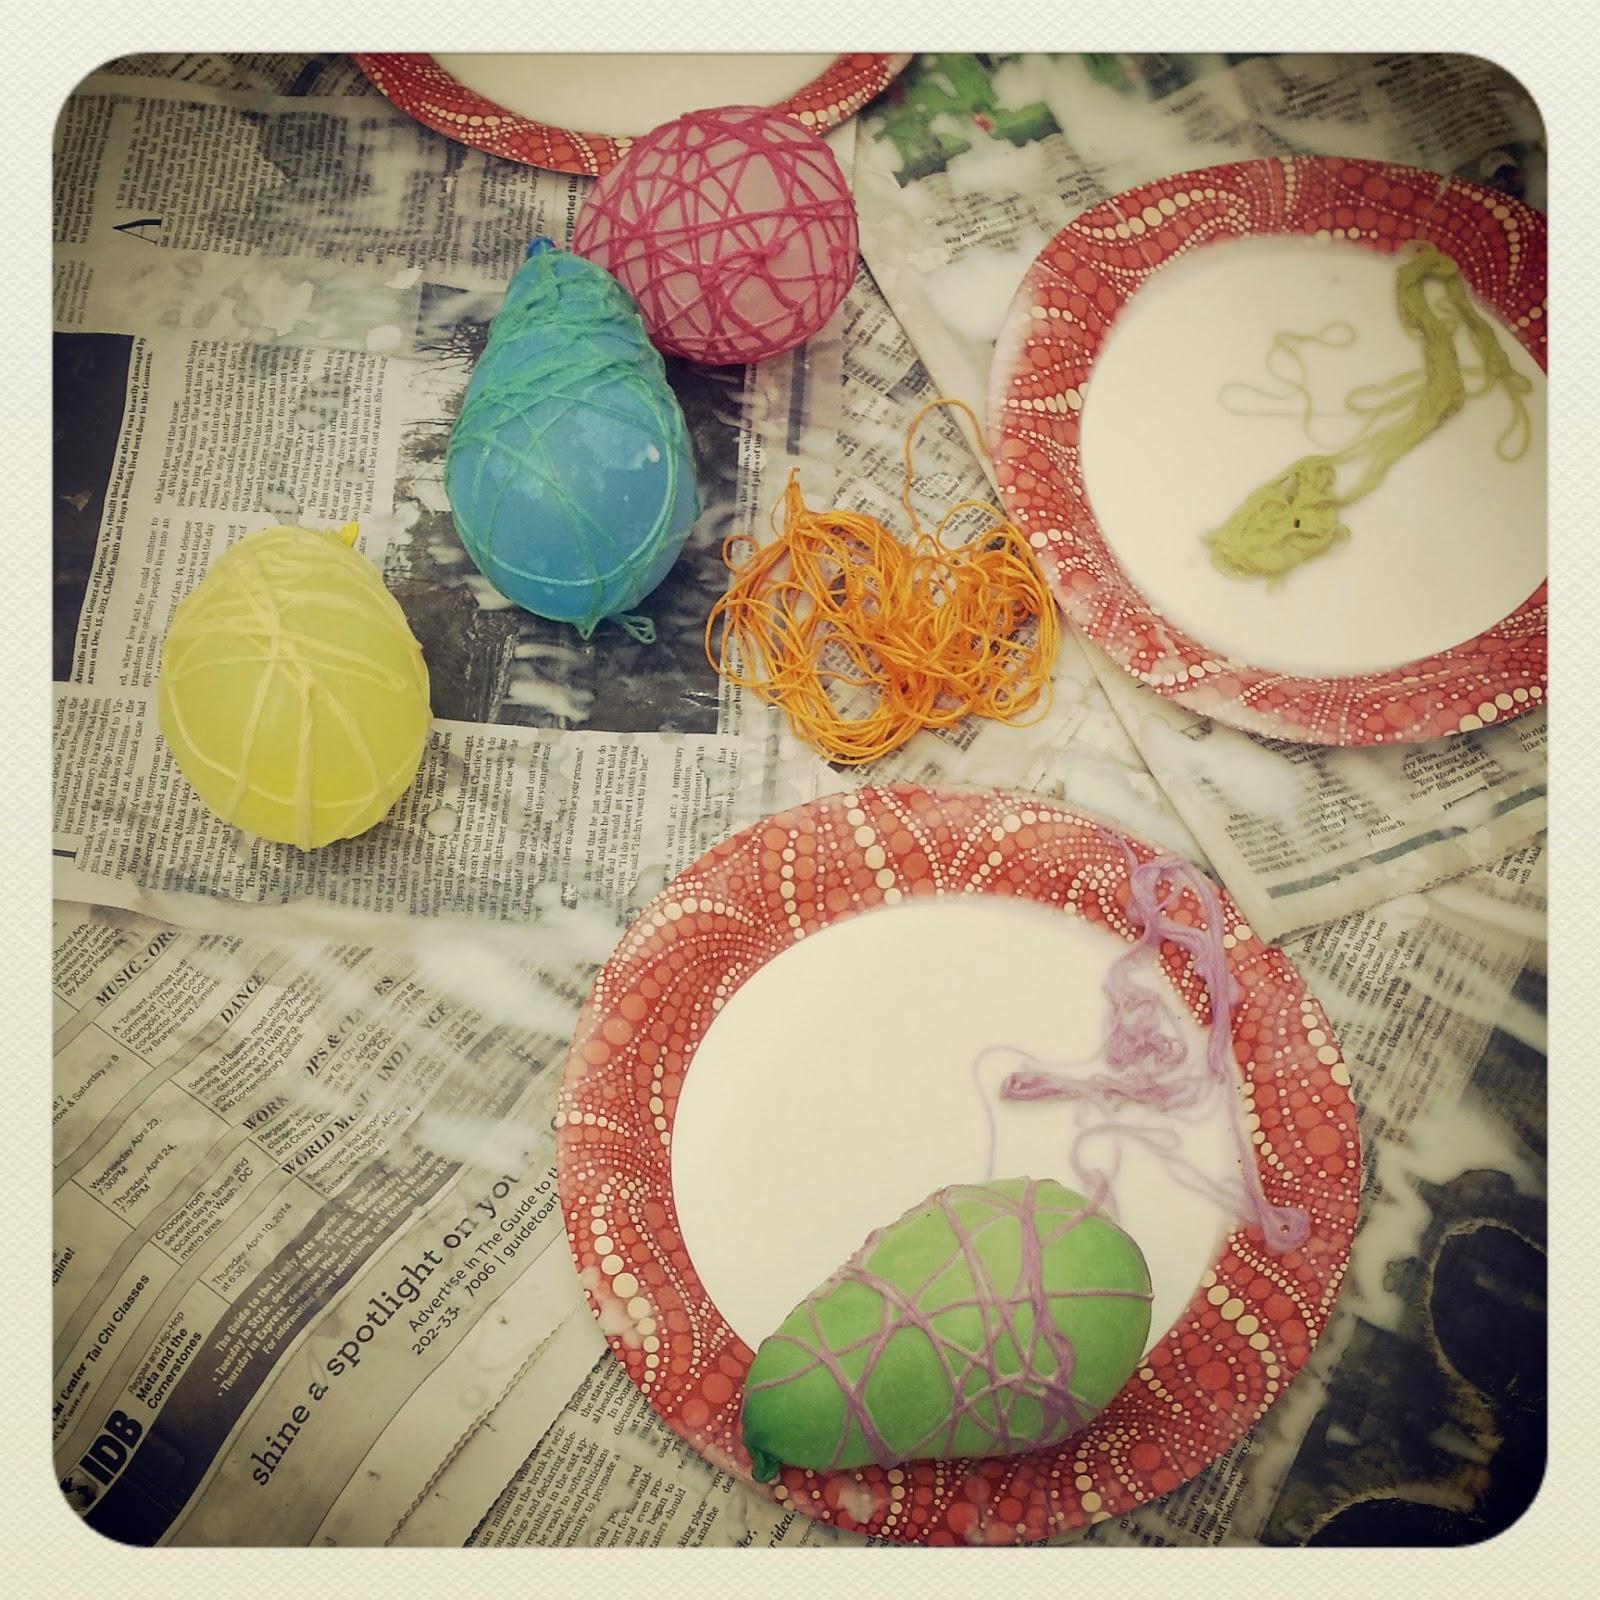 Manualidades au pair: Easter eggs